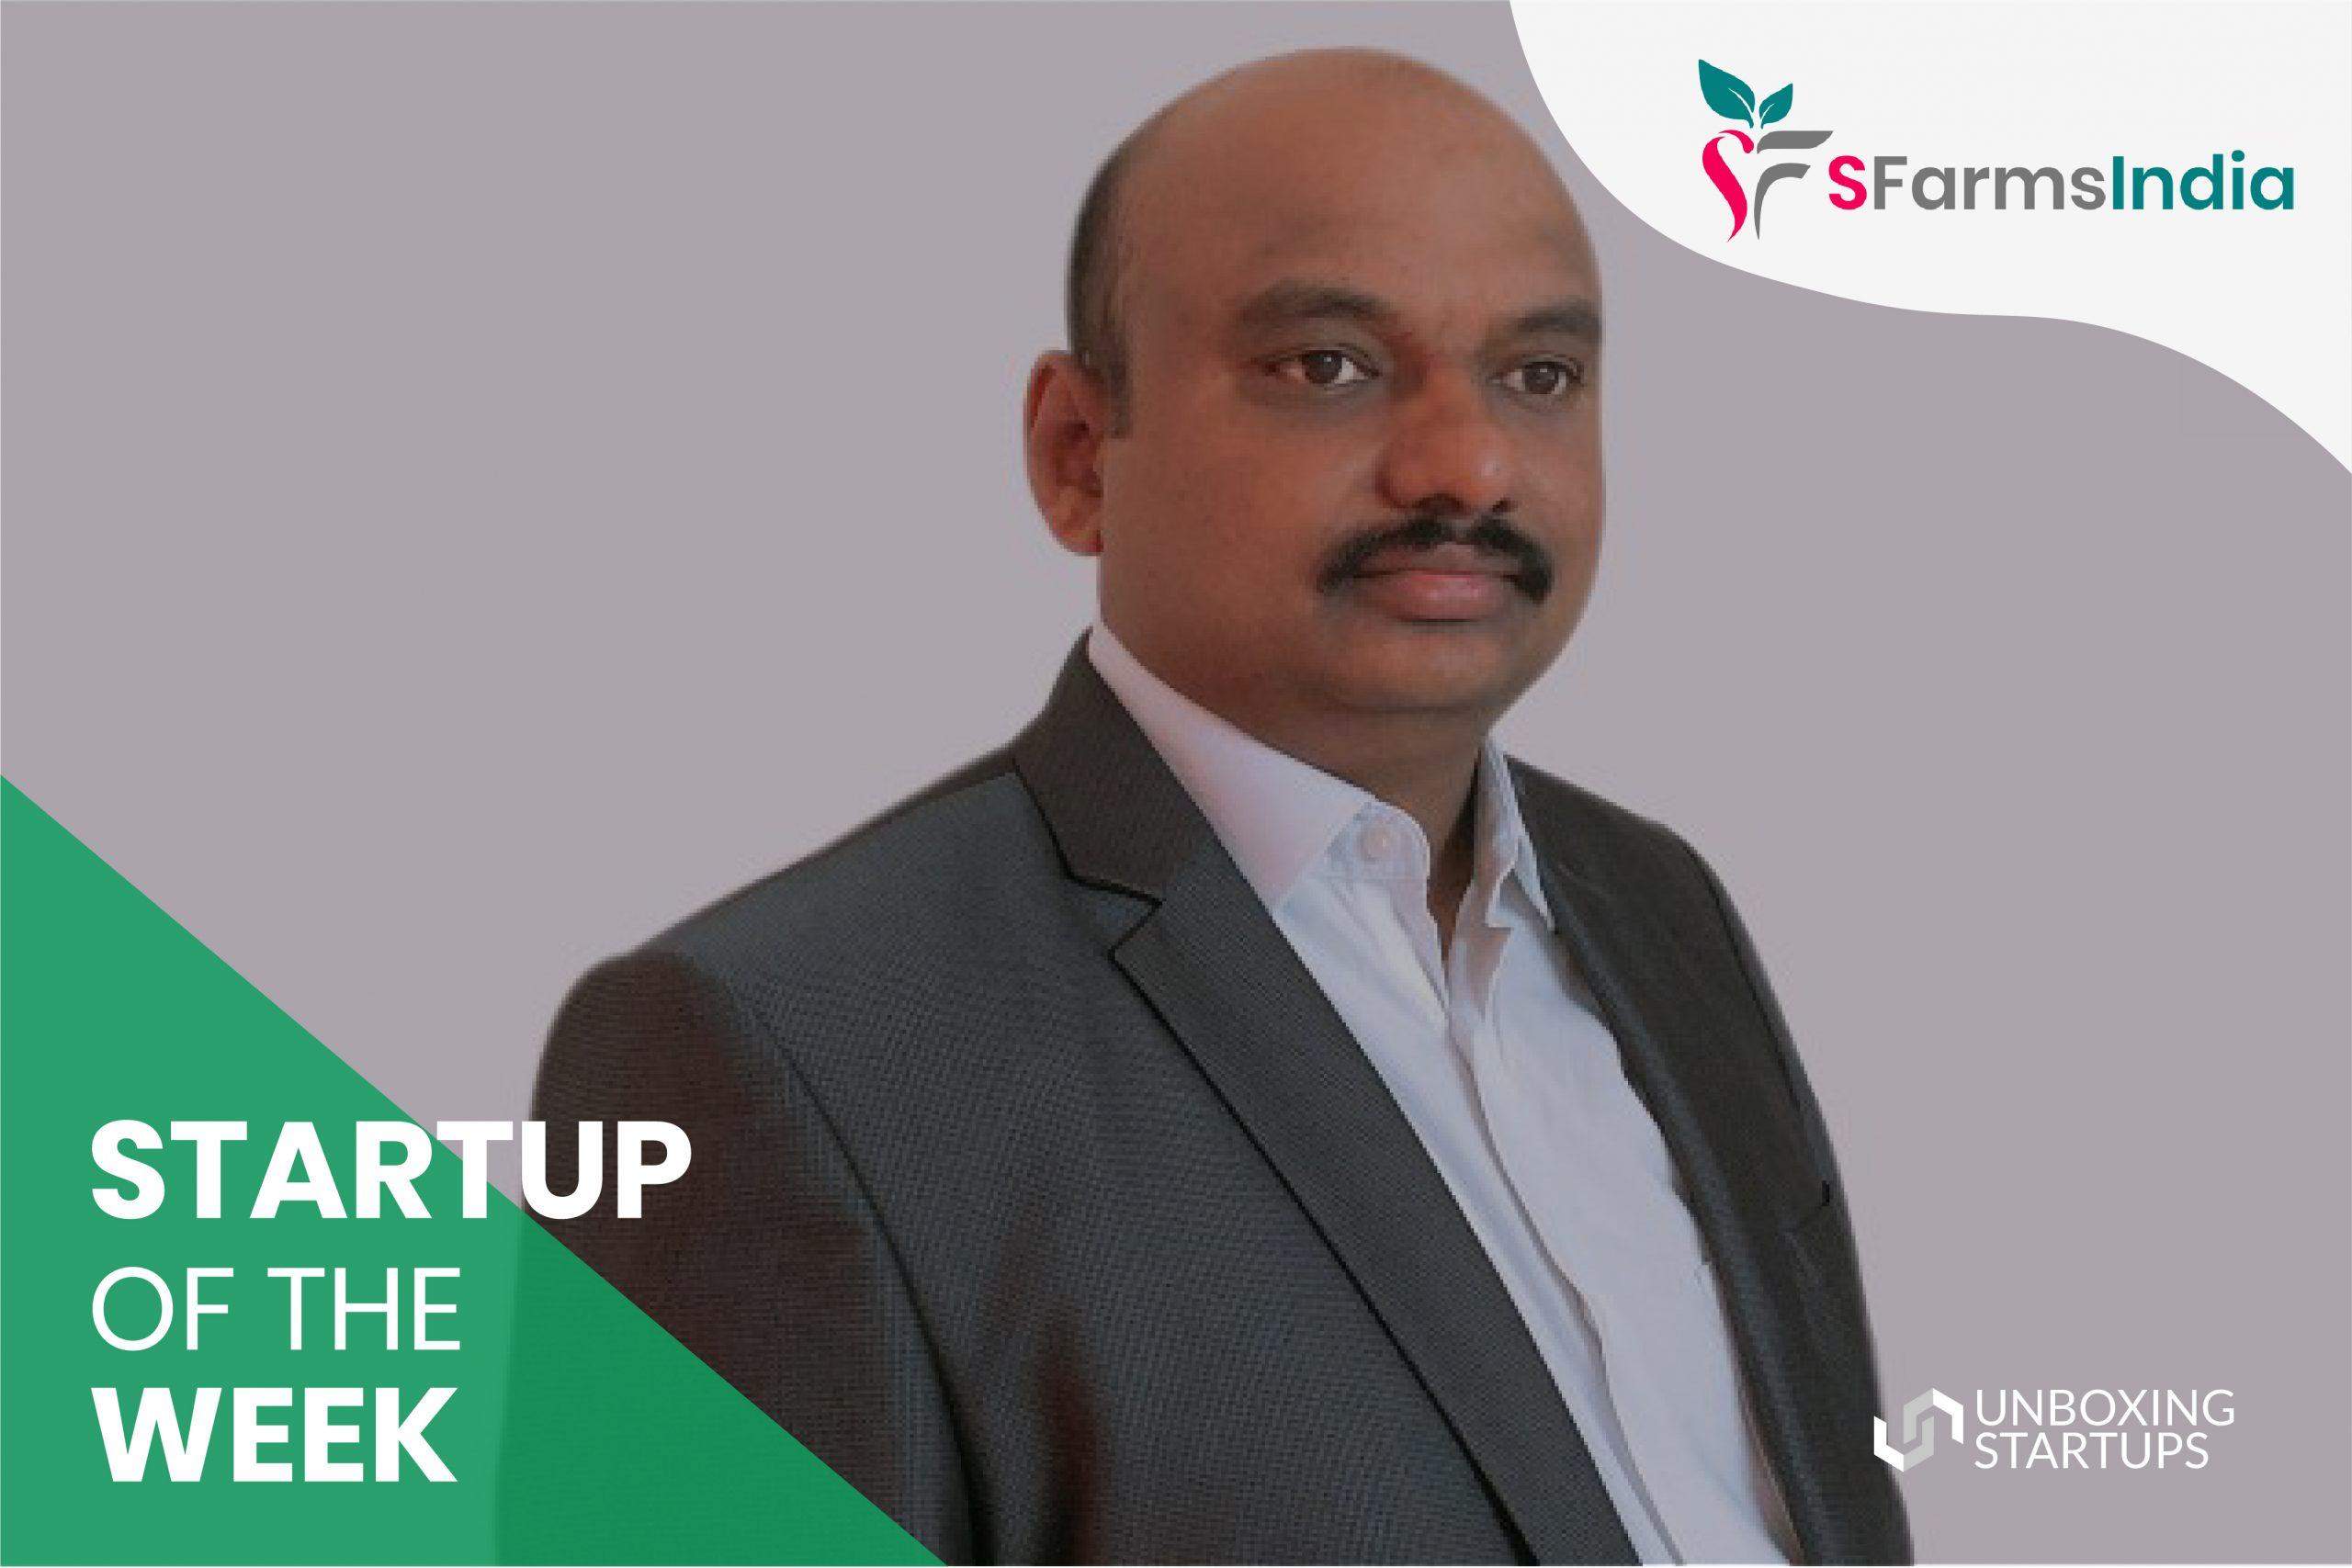 startup of the week sfarmsindia